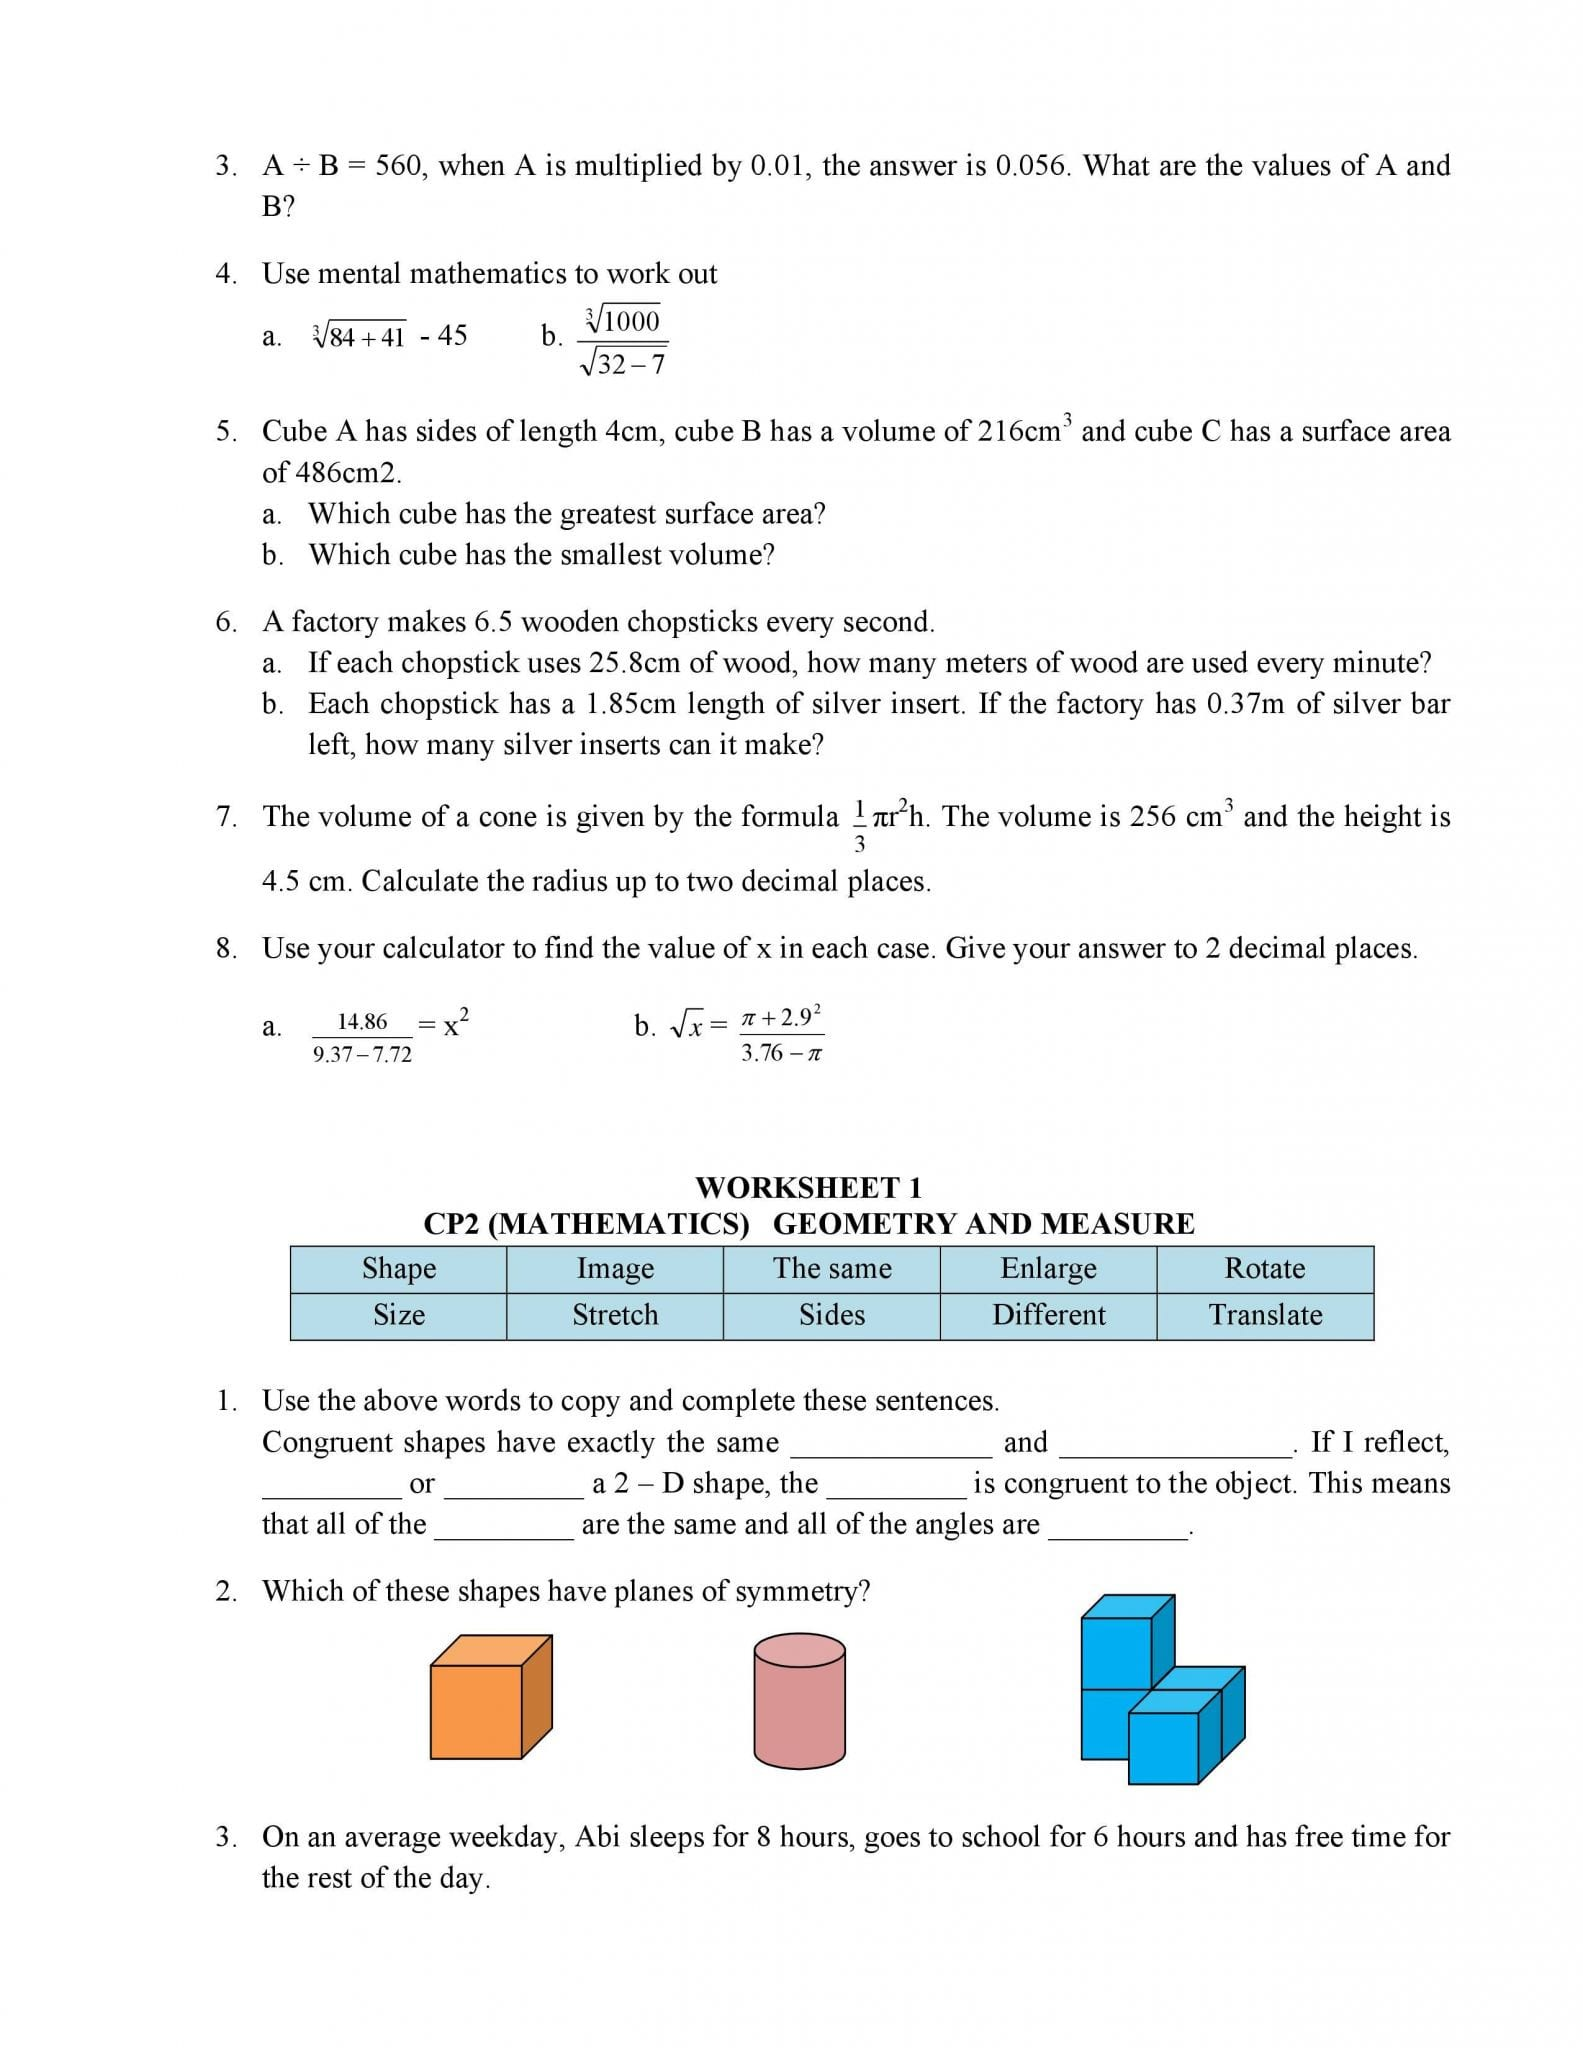 Algebra 1 Worksheet 1 5 Translating Expressions Answer Key